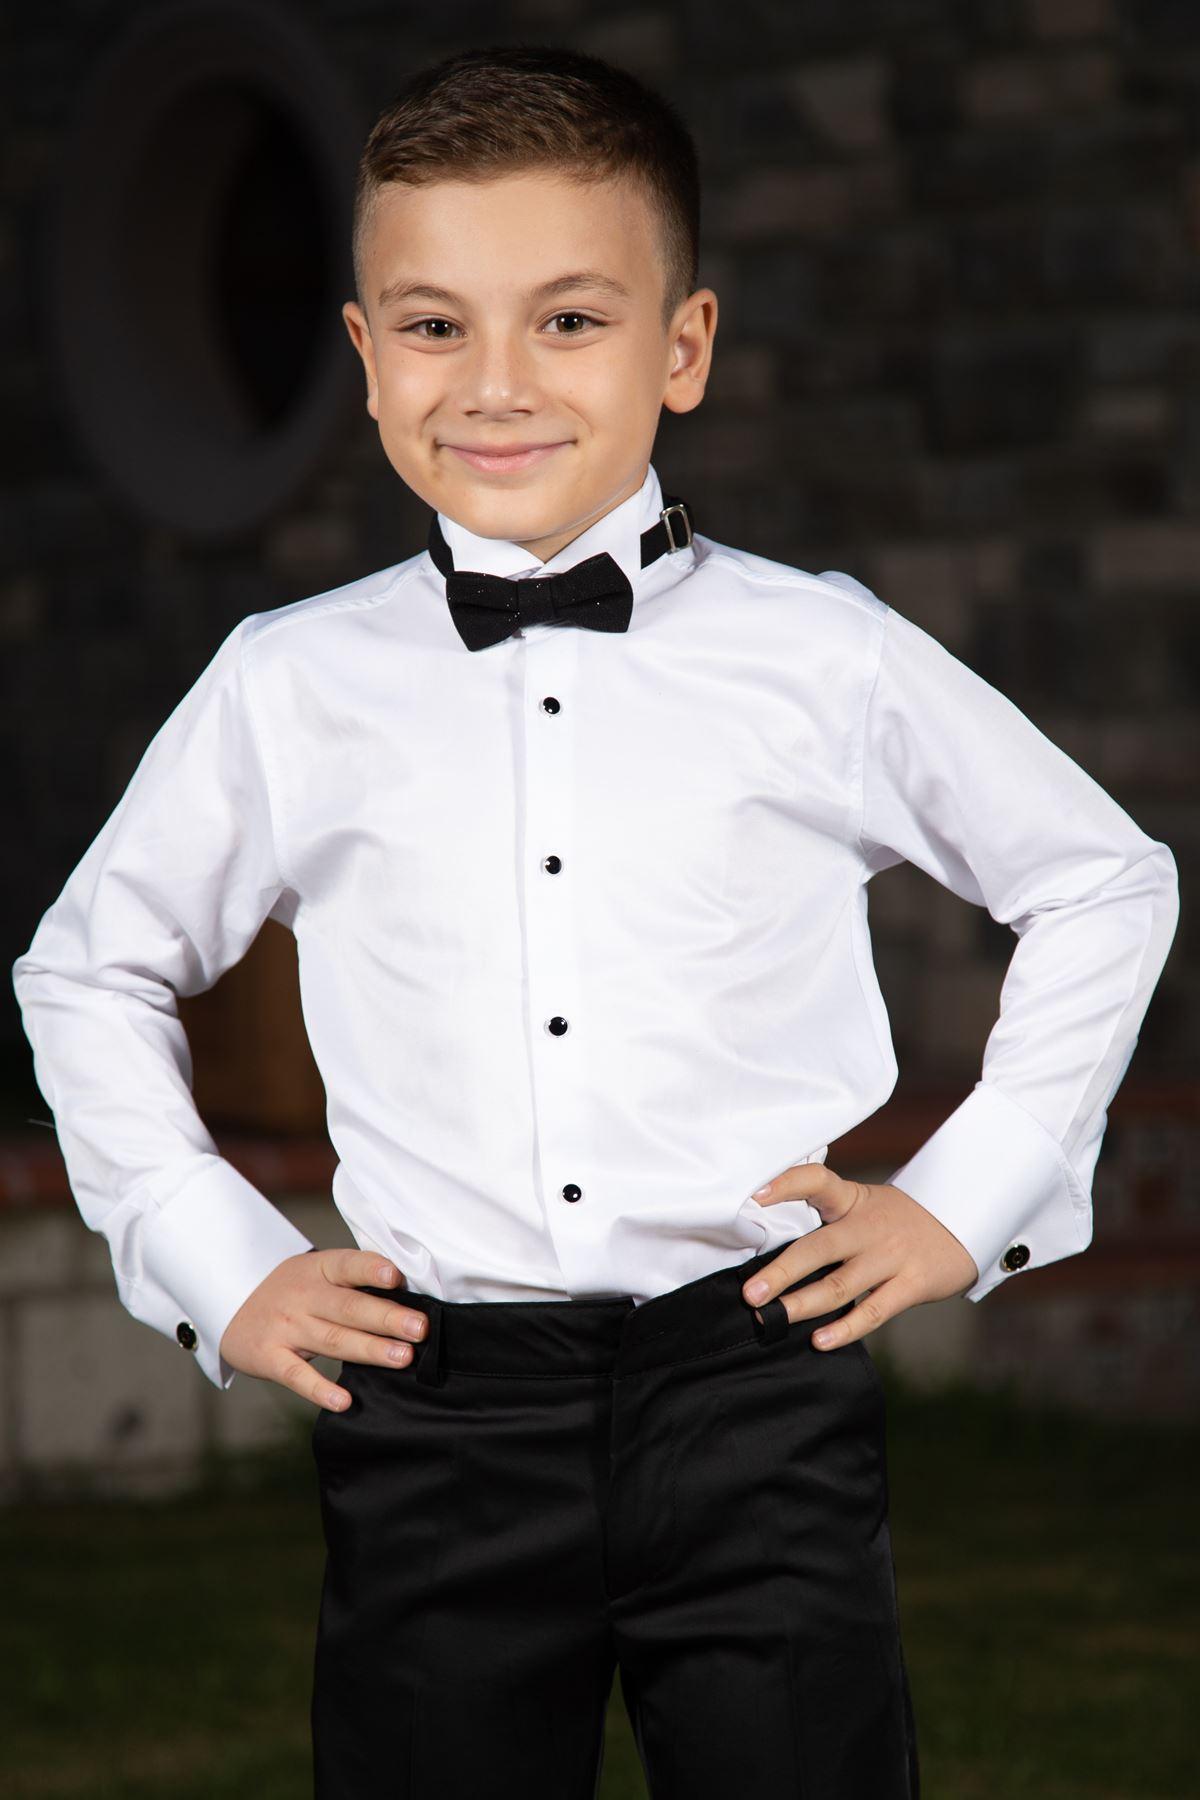 Hästkrage, svart manschettknapp, pojkeskjorta 1003 vit